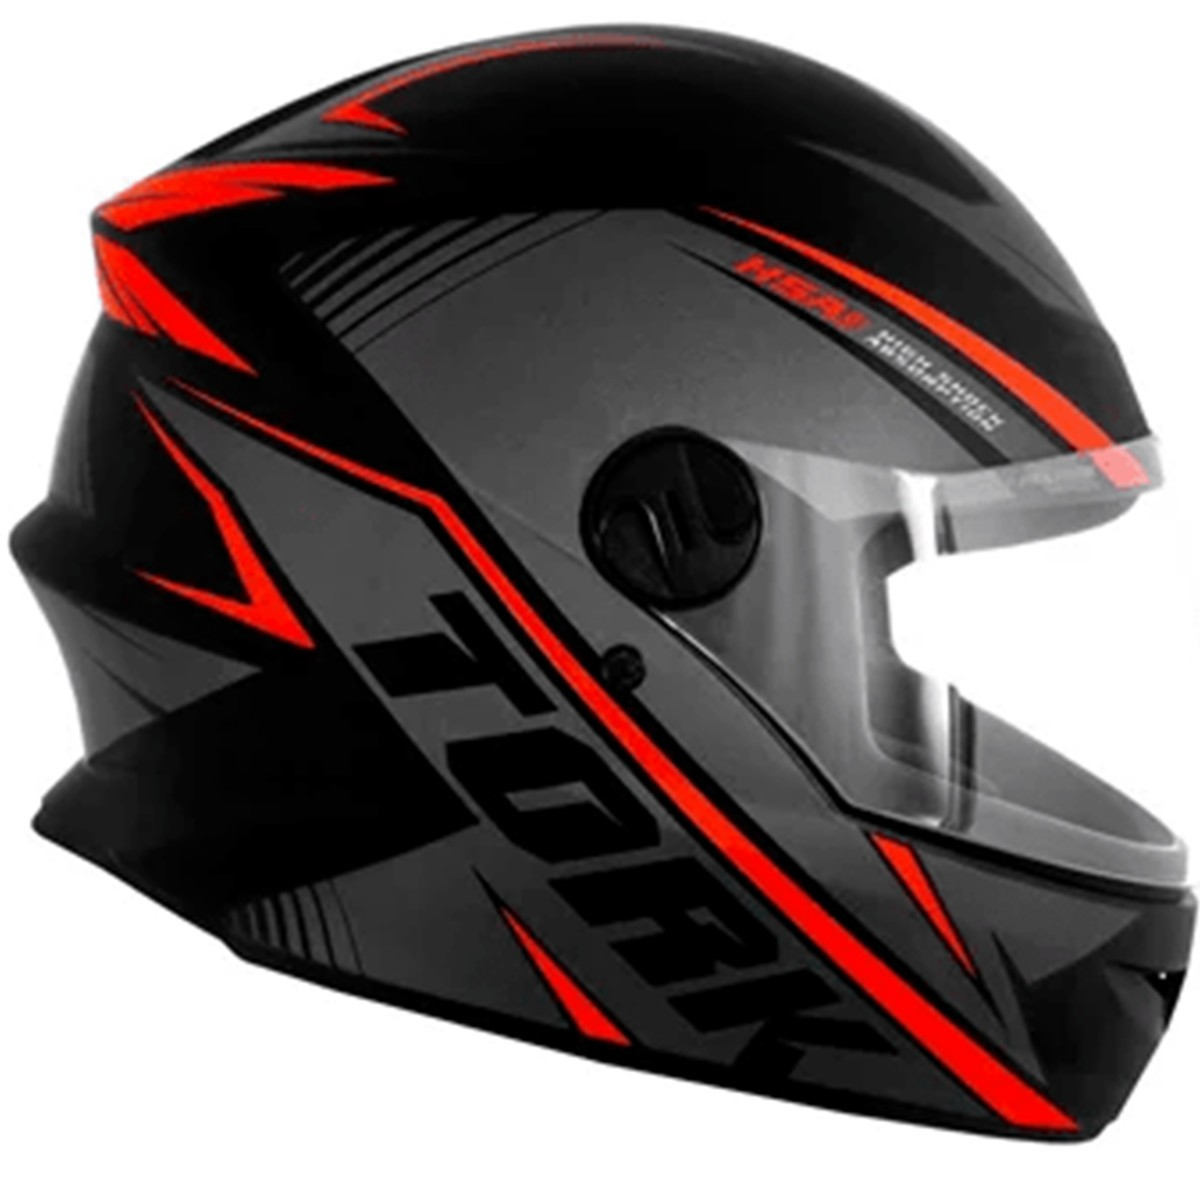 Capacete Moto Pro Tork R8 Fechado Vermelho